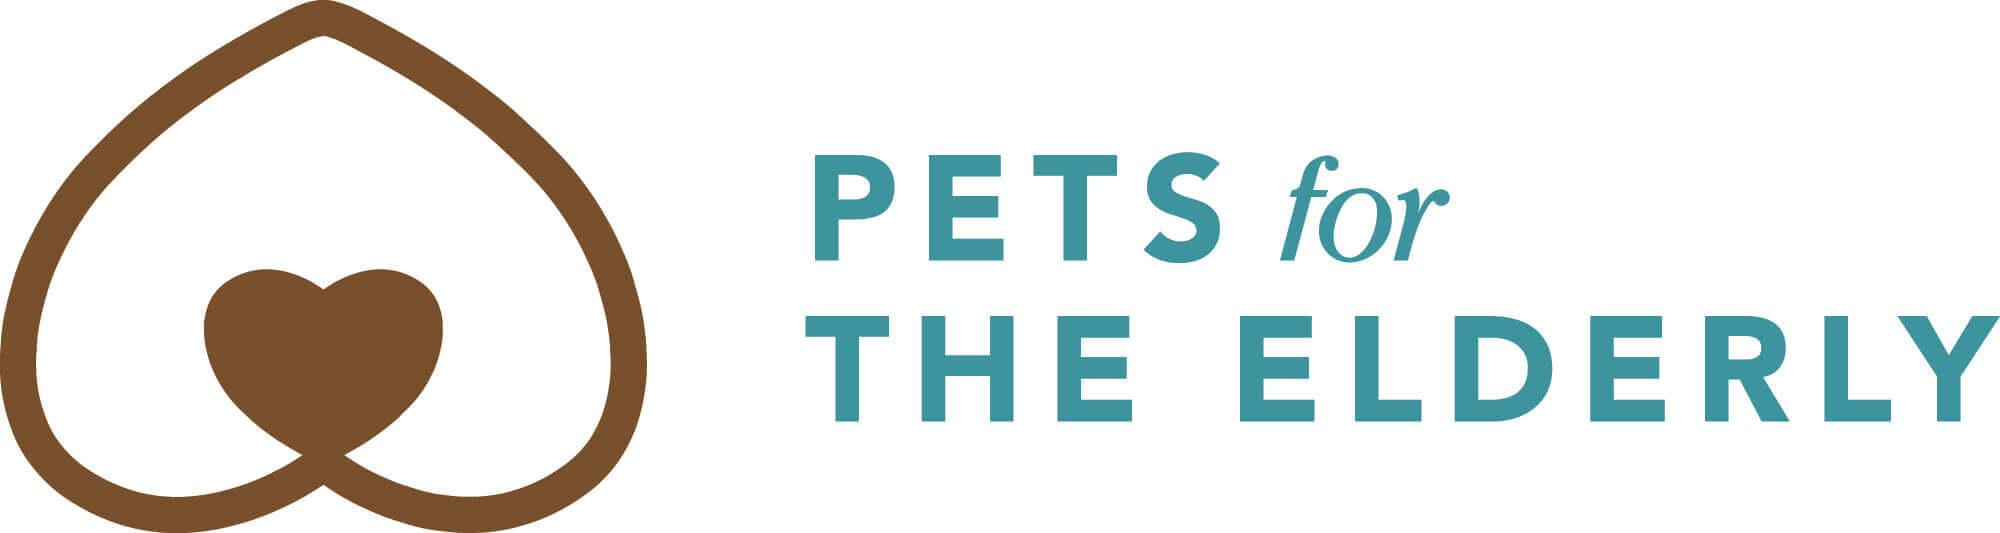 pets for the elderly logo